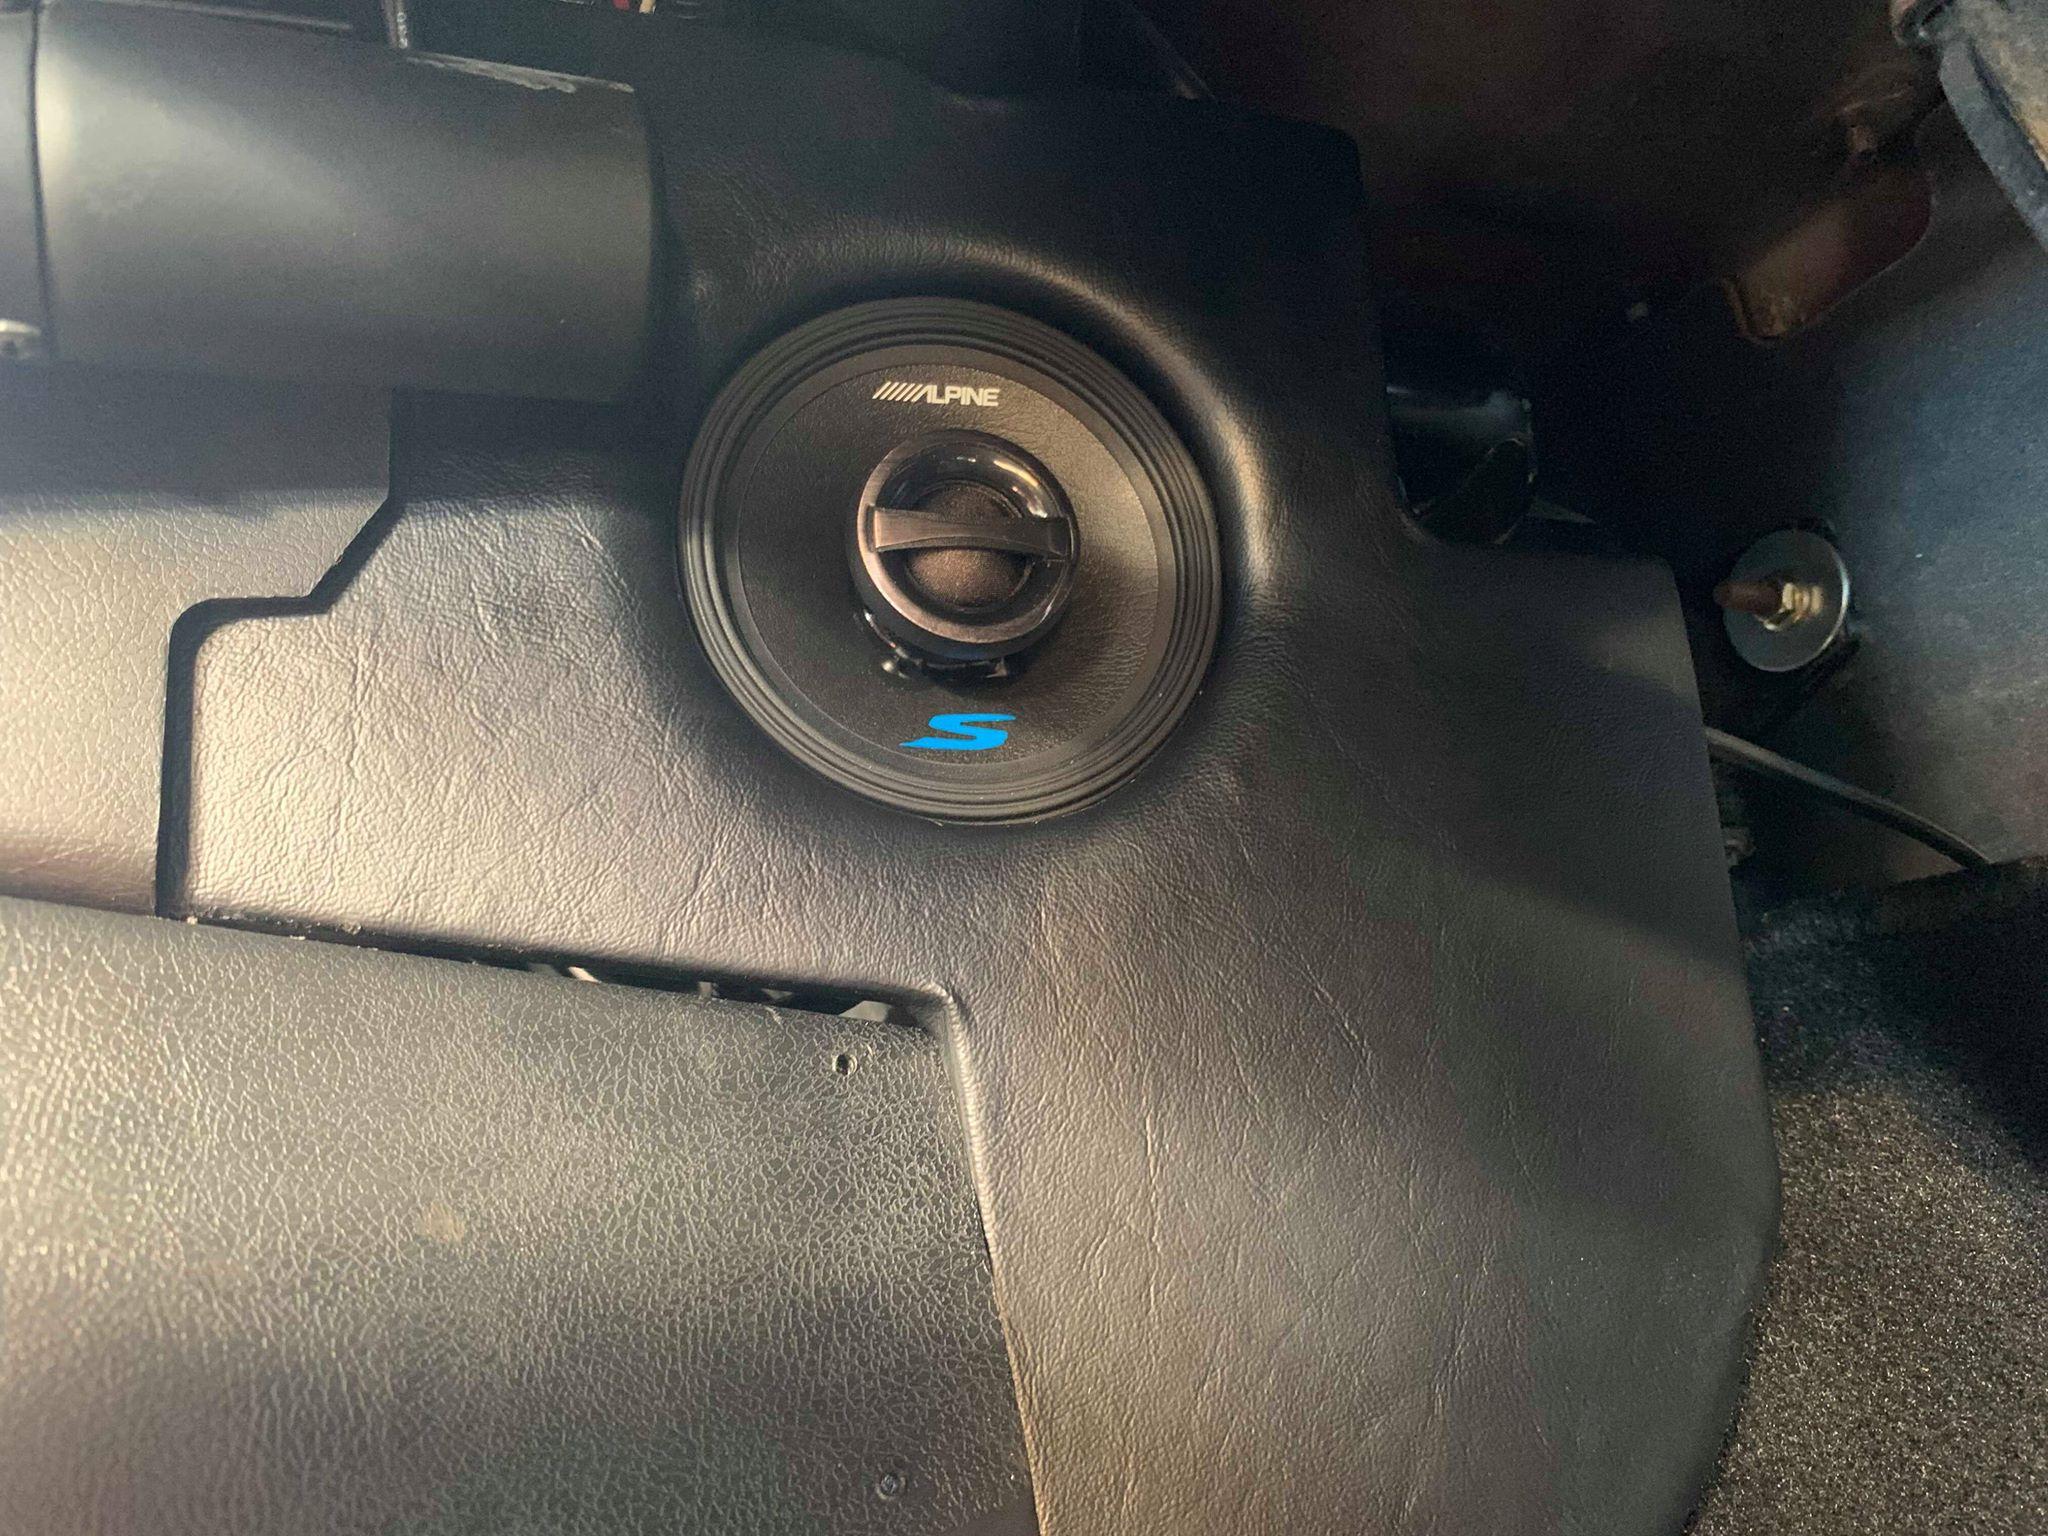 Mazda Capella - https://www.newcastleprosound.com.au/wp-content/uploads/2019/07/67205596_424996428094185_8847215227658305536_n.jpg